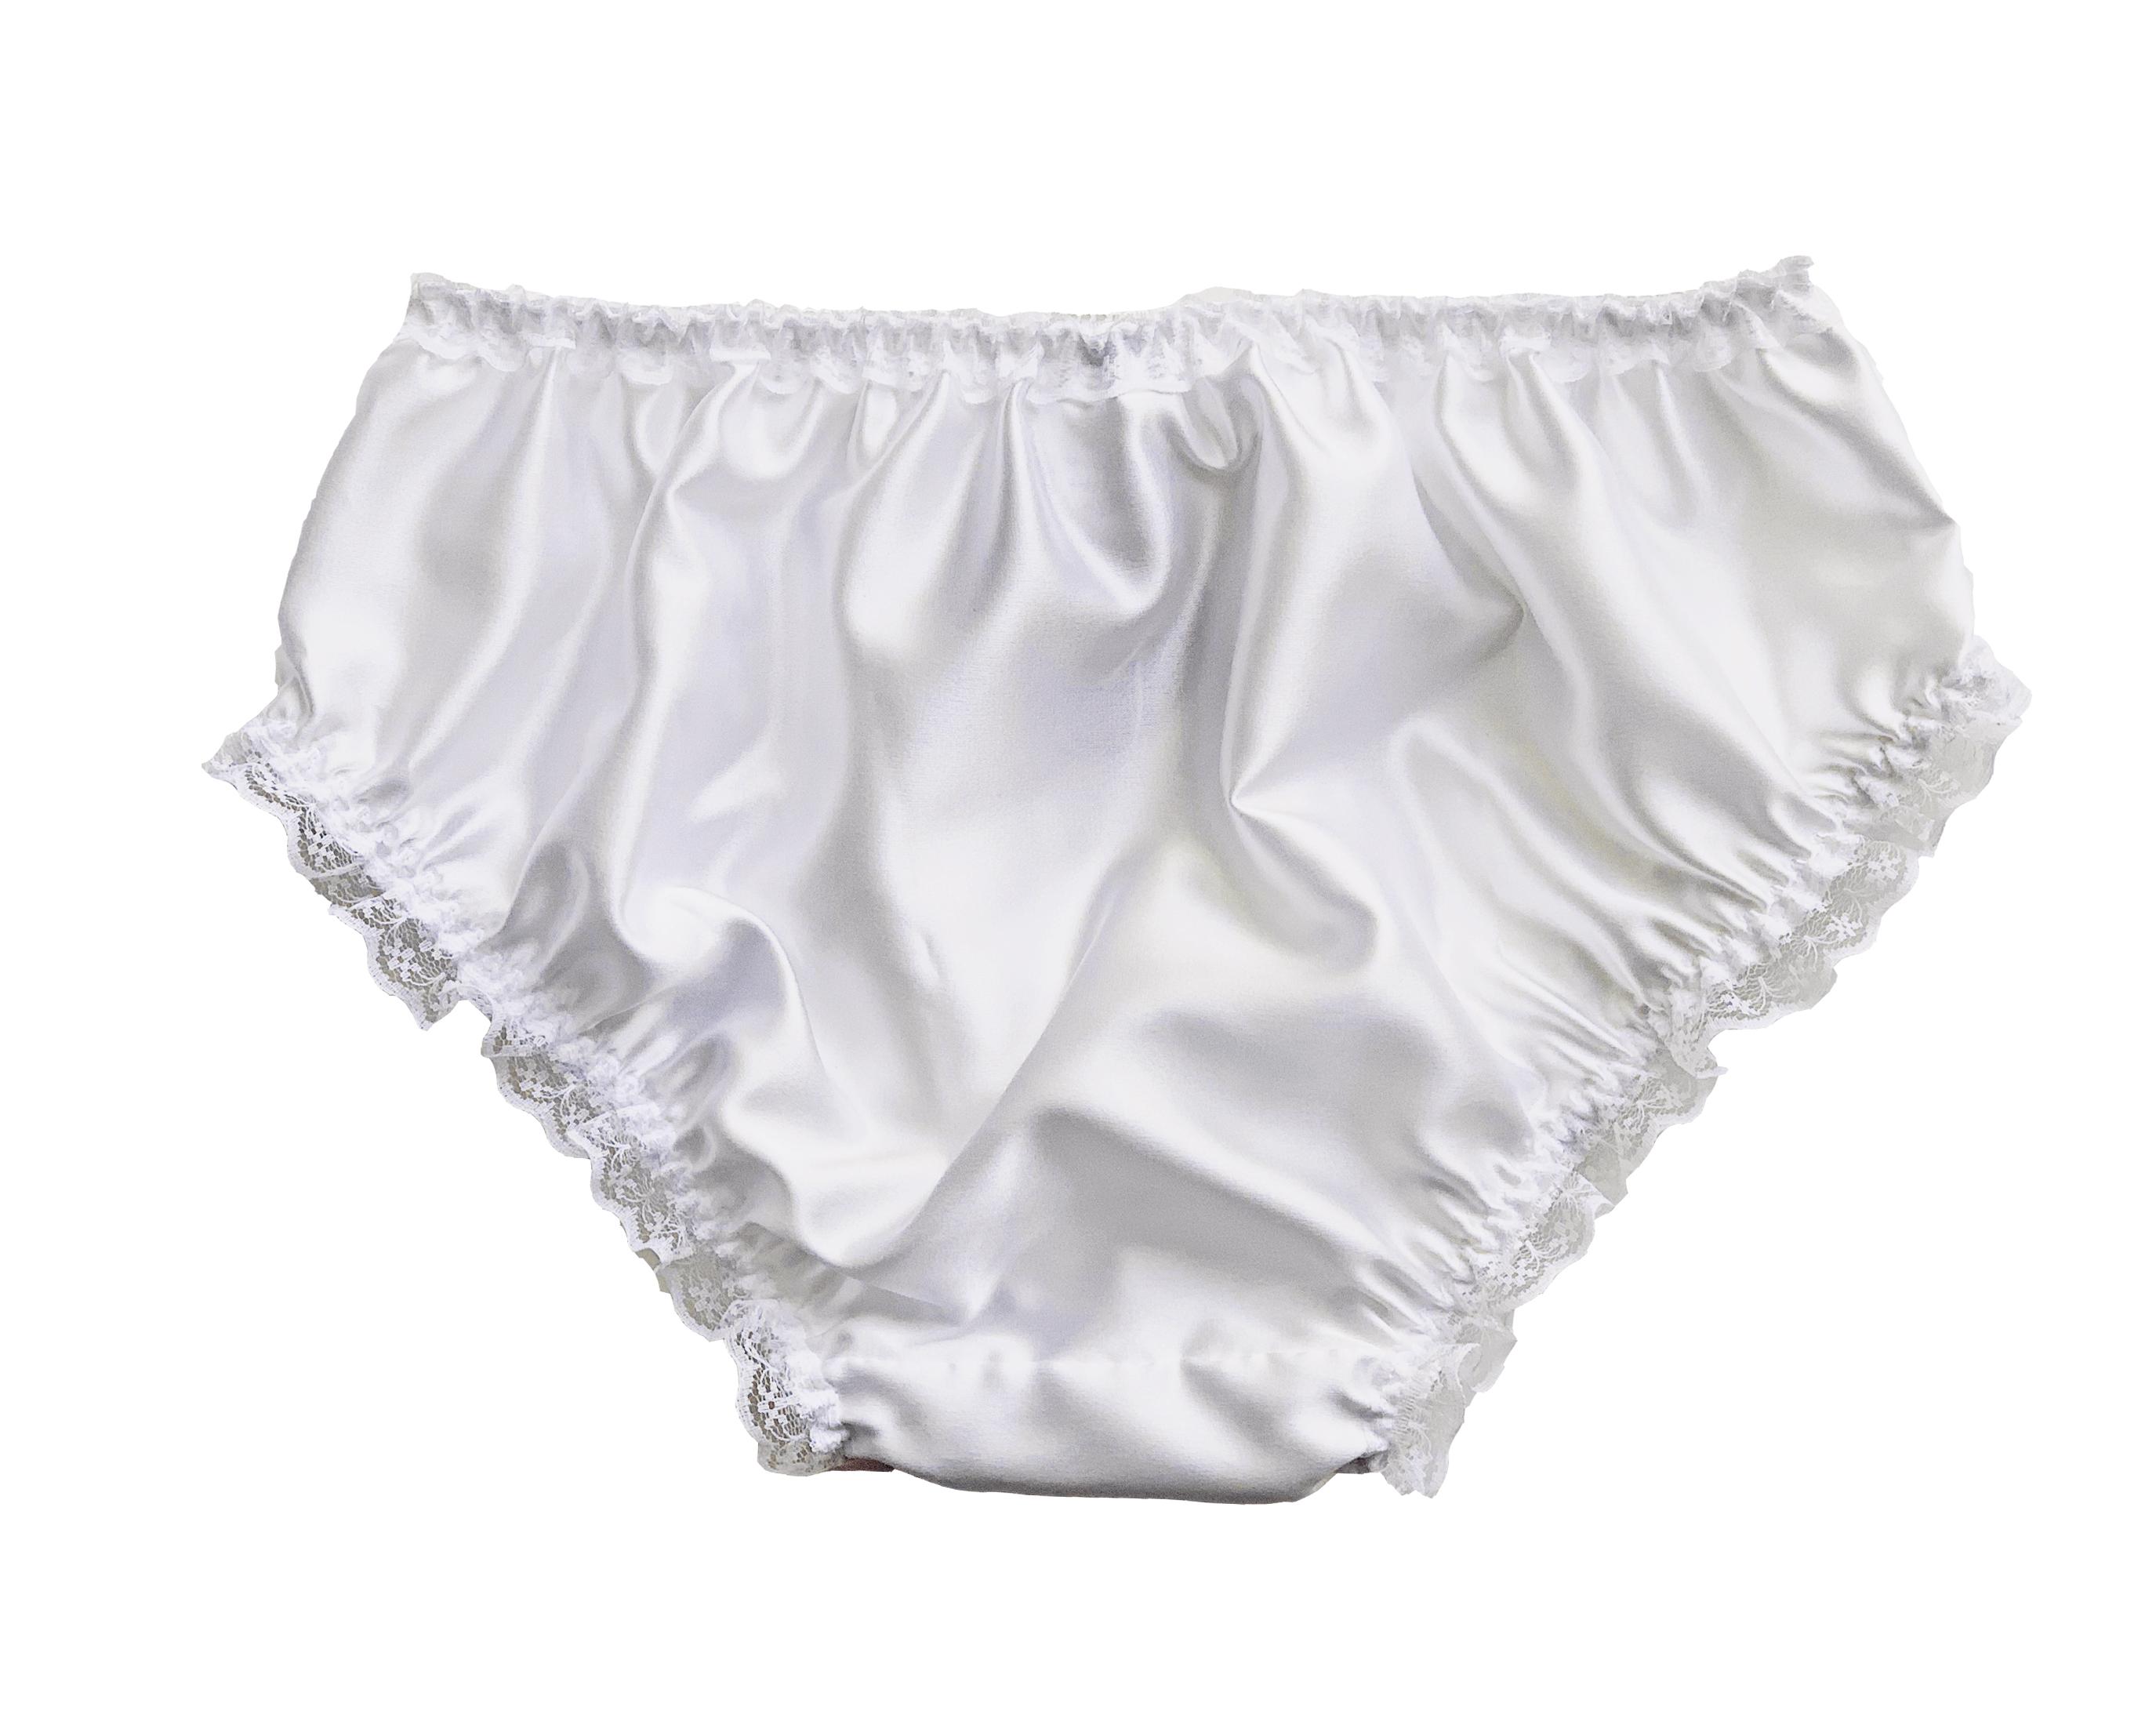 White Satin Frilly Lace Trim Sissy Panties Knicker Underwear Briefs Size 10-20